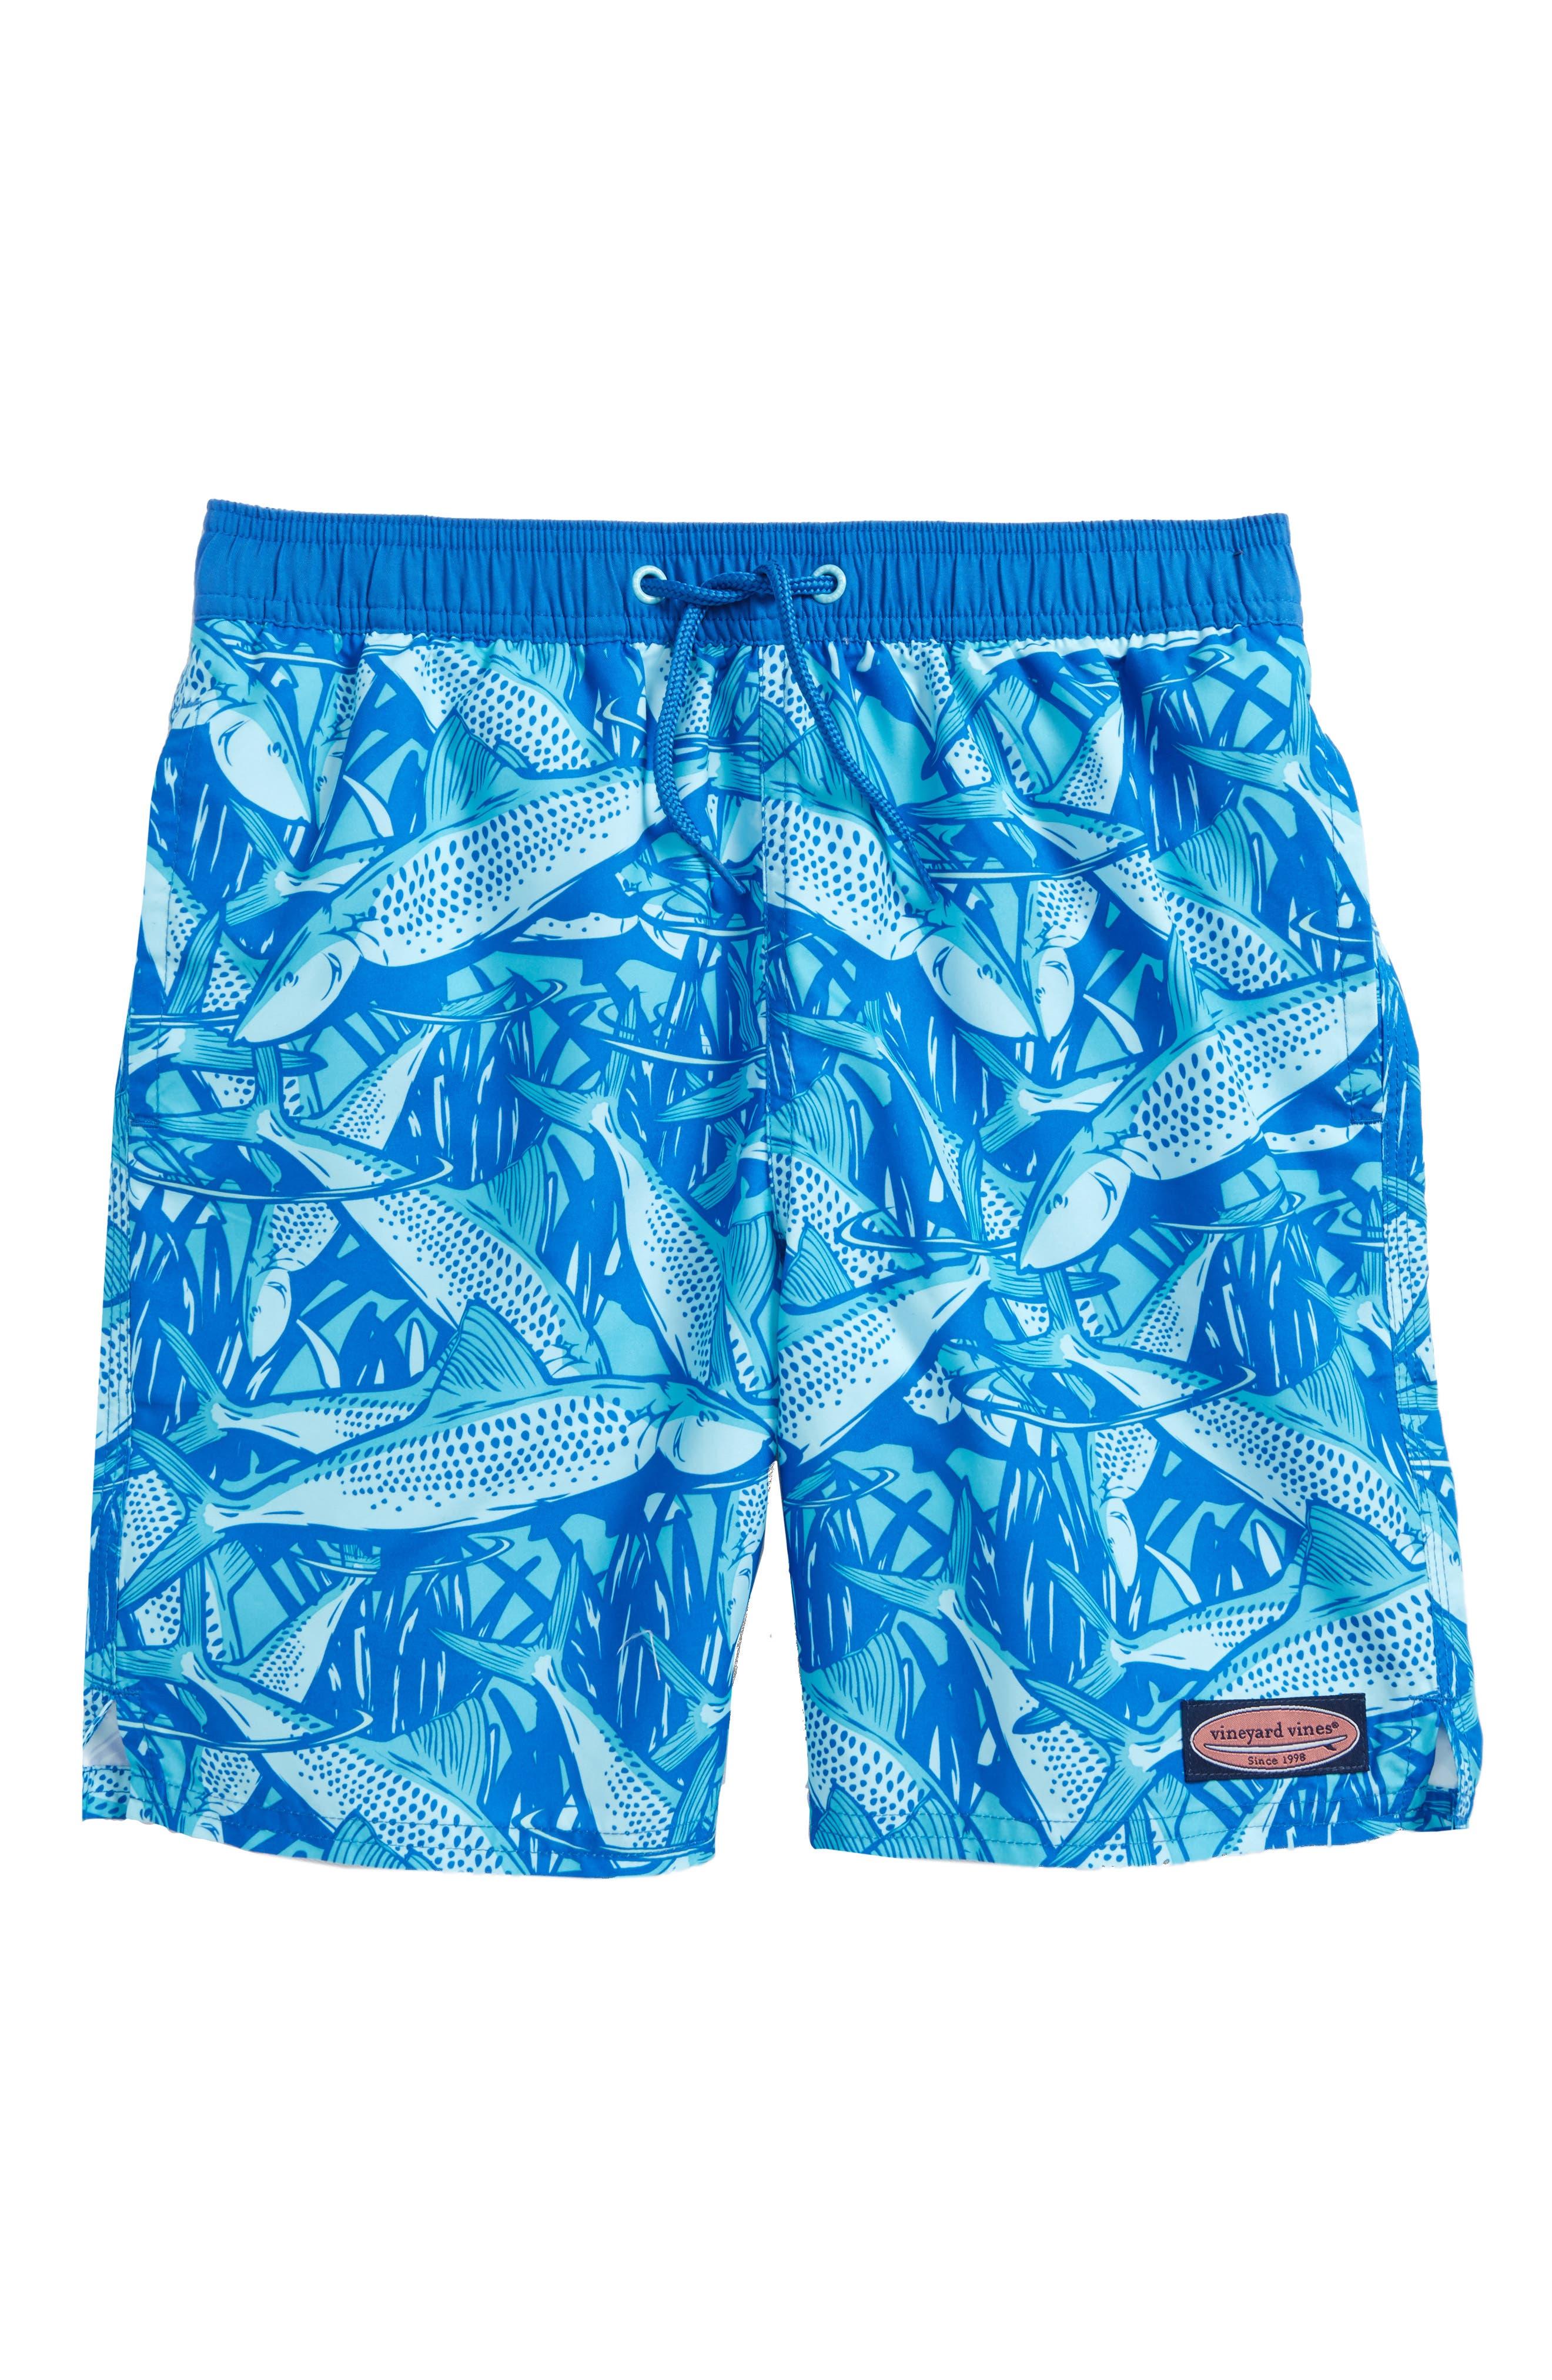 Chappy Bonefish Swim Trunks,                             Main thumbnail 1, color,                             Turquoise